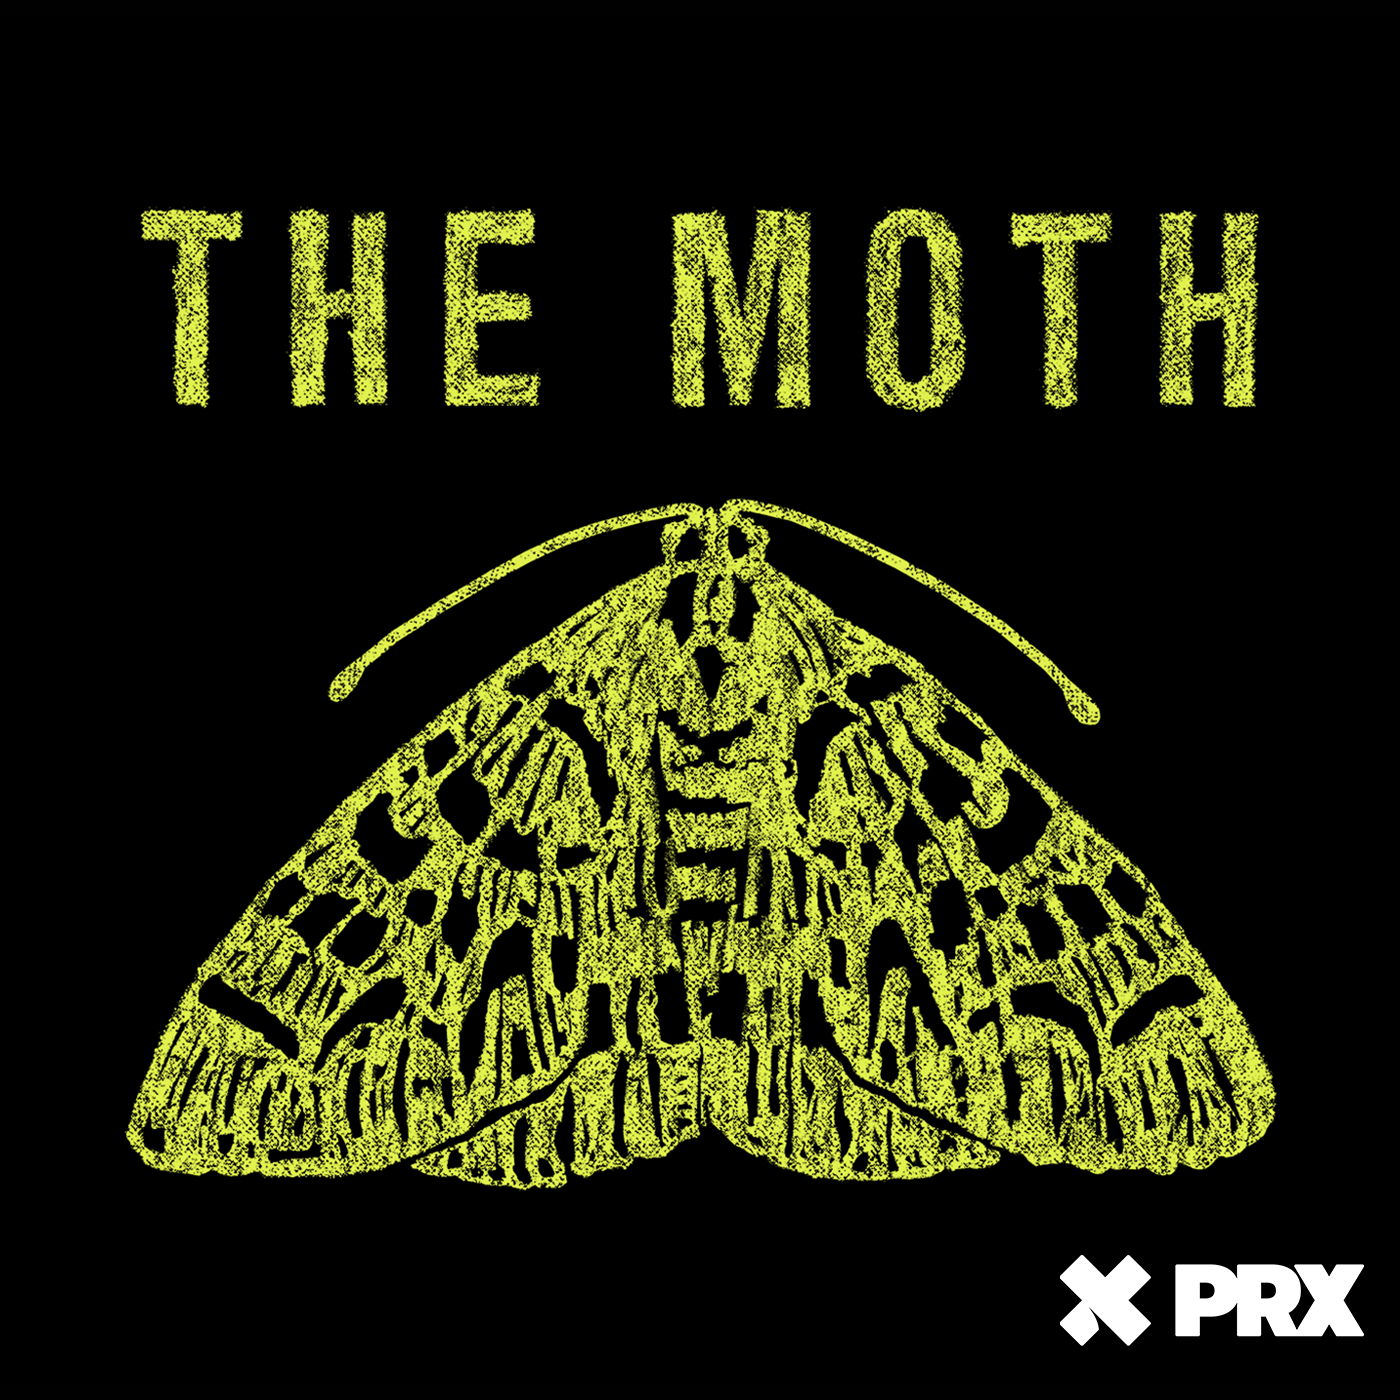 The Moth Radio Hour: Pleasantly Surprised